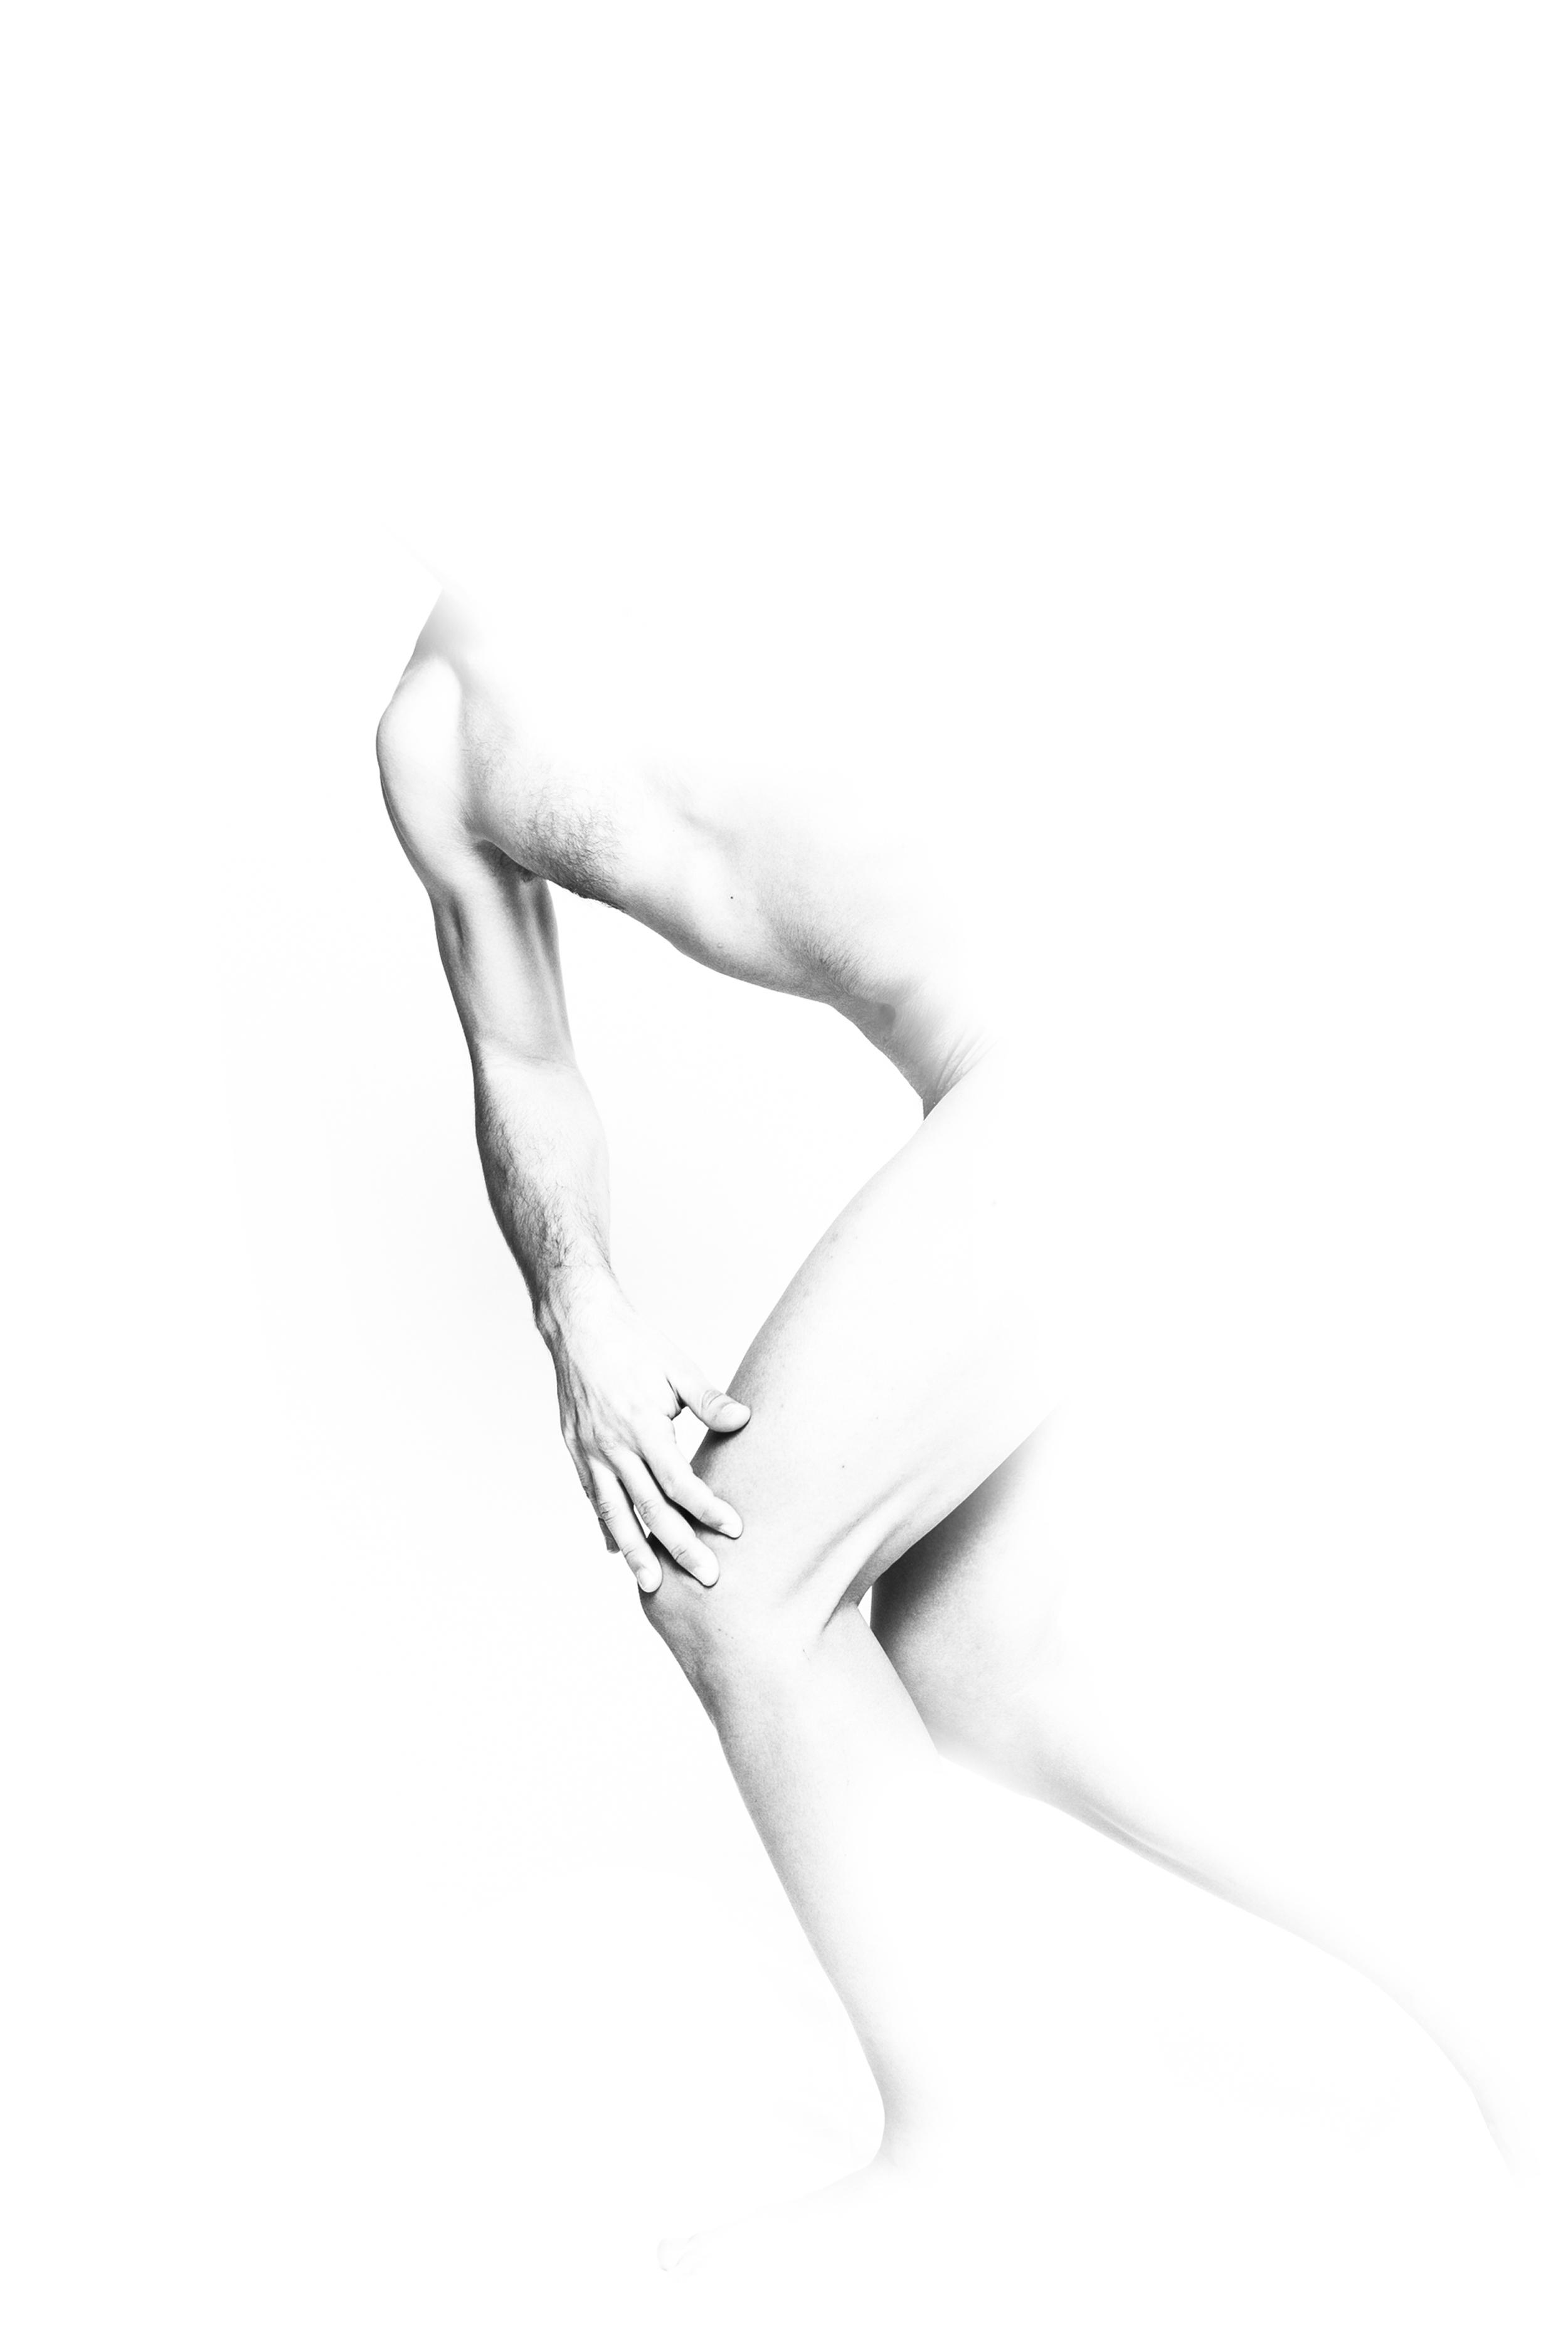 © Virginia Zeqireya